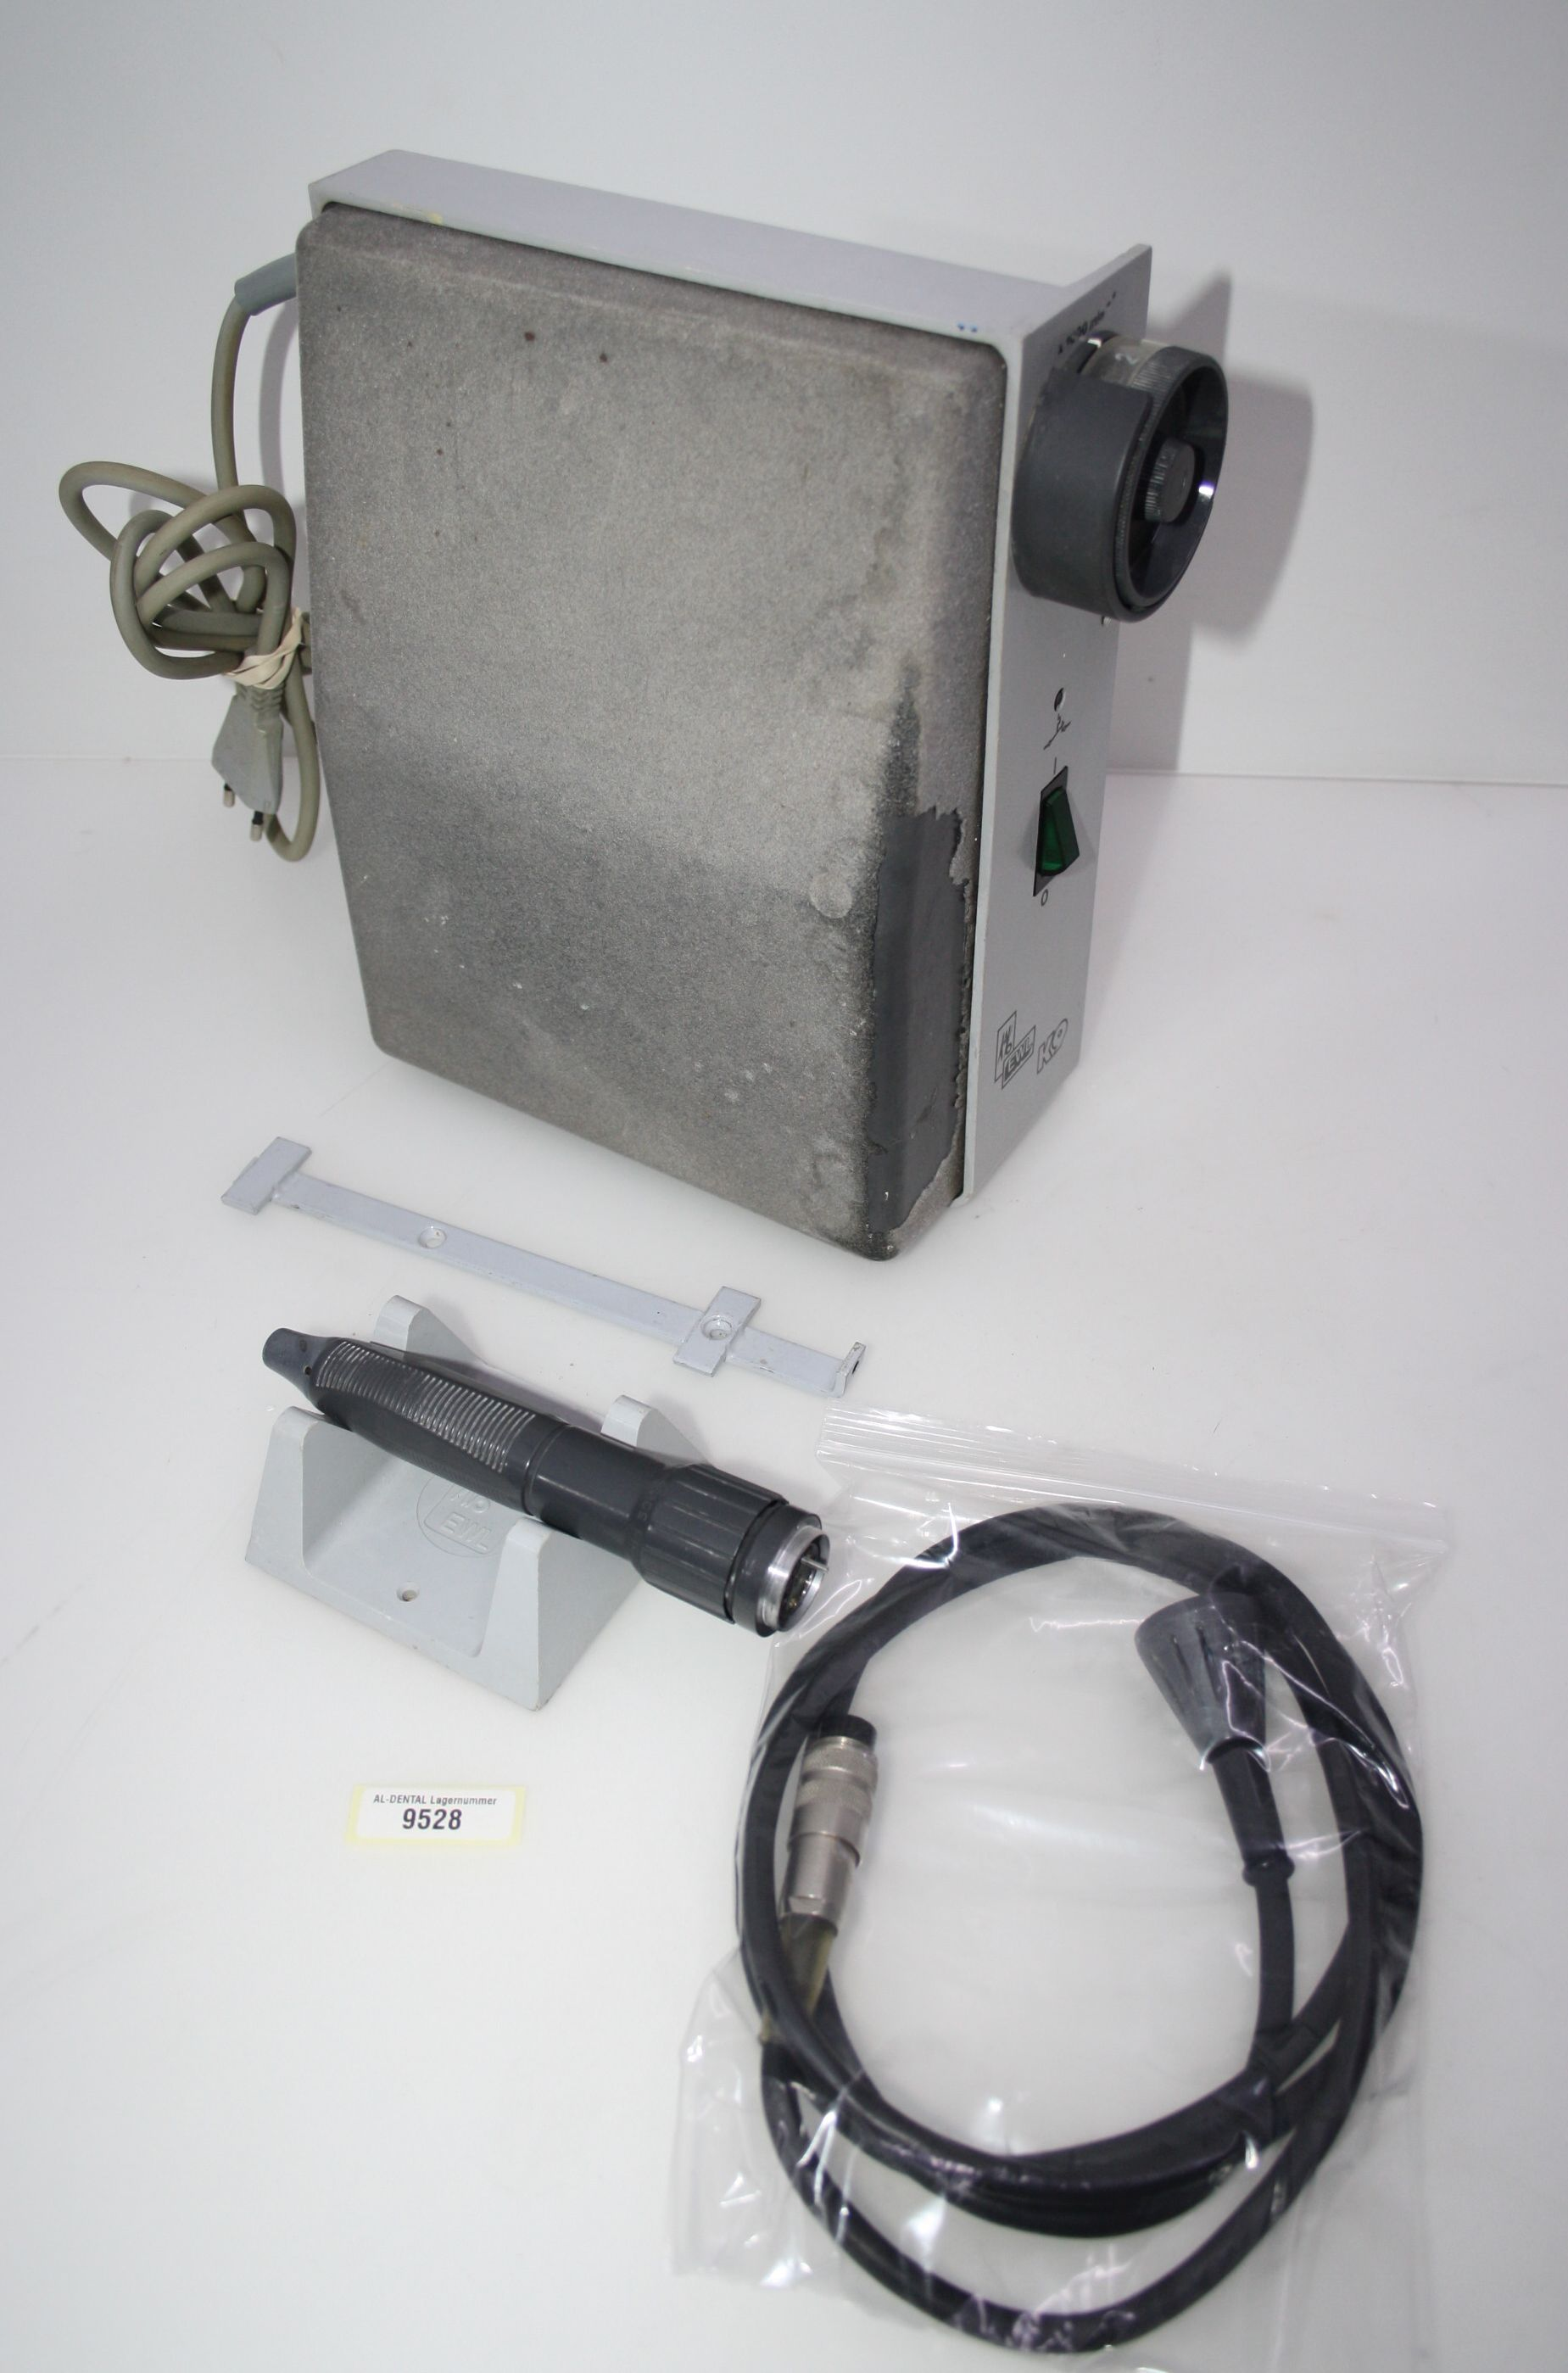 KaVo K 9 Anlage komplett / Technikmaschine # 9521